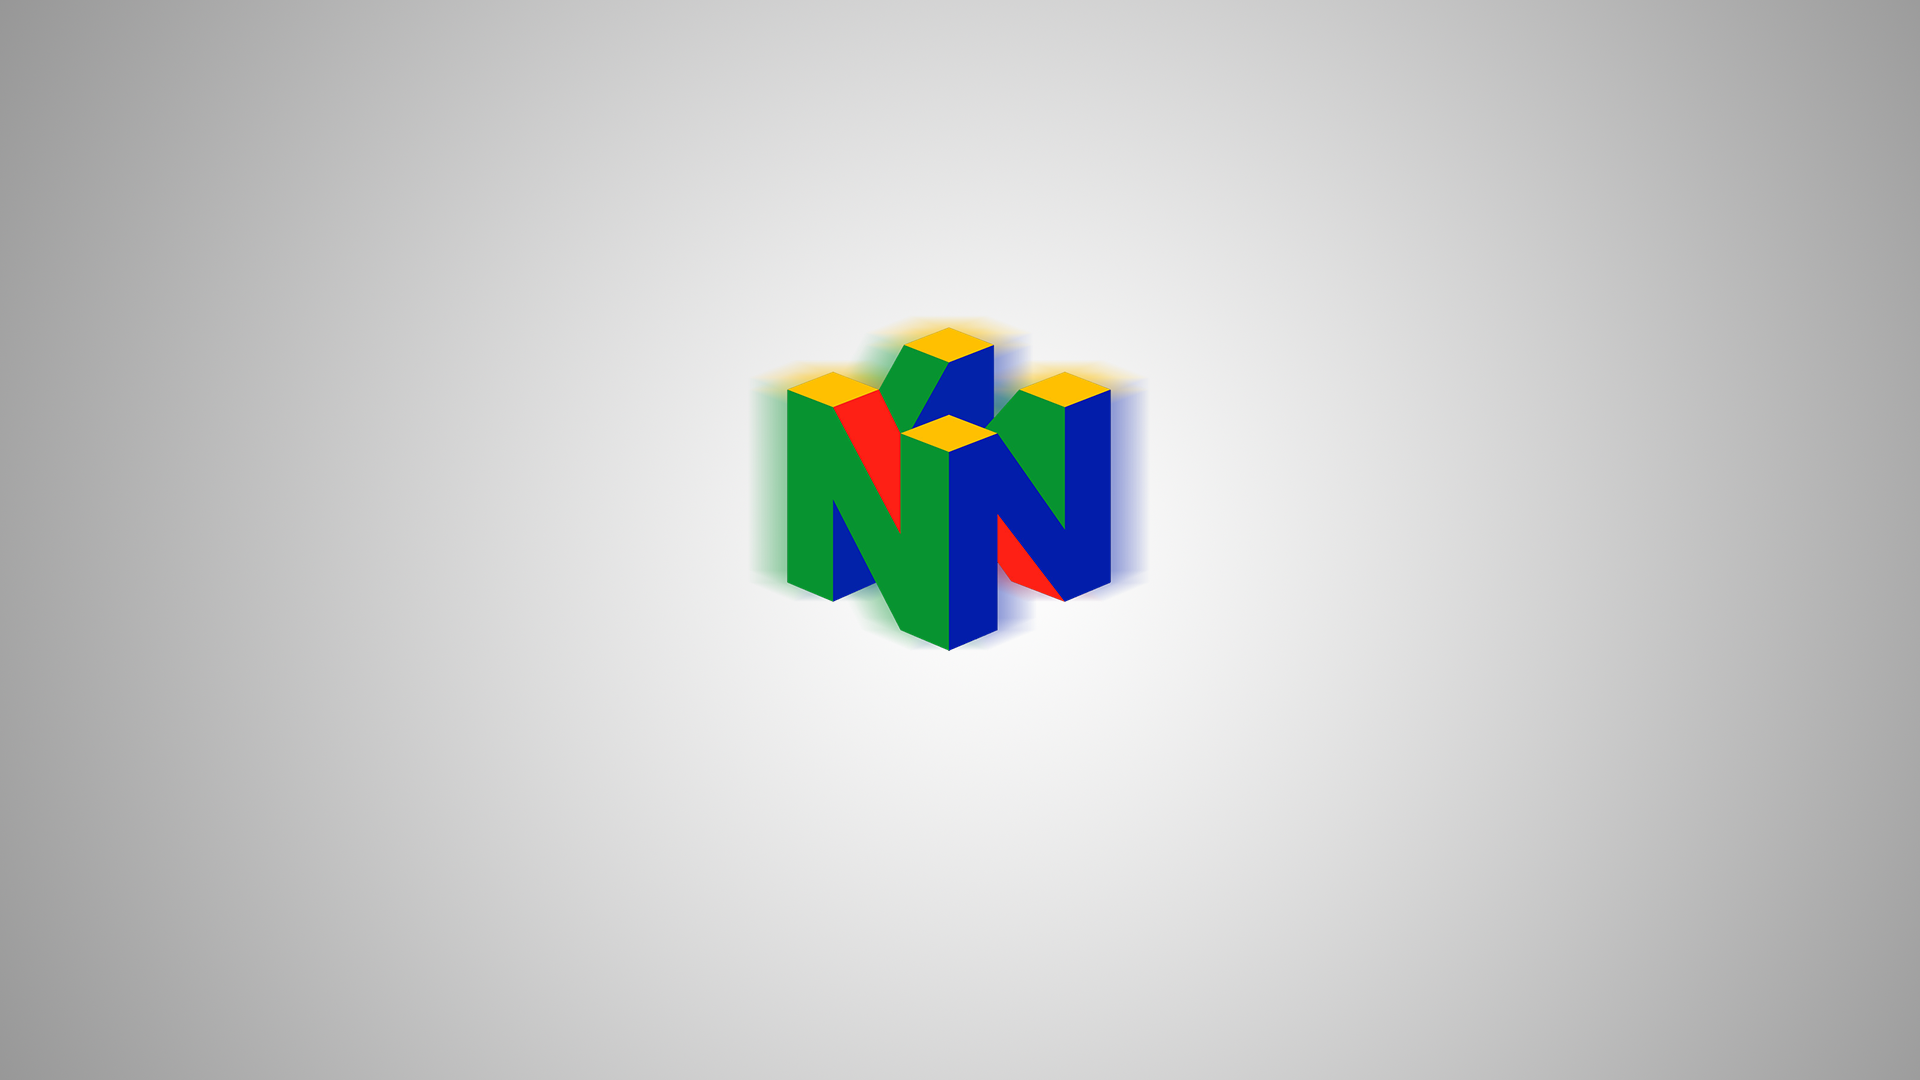 N64-Logo-HD-Wallpaper by CraftyBro on DeviantArt